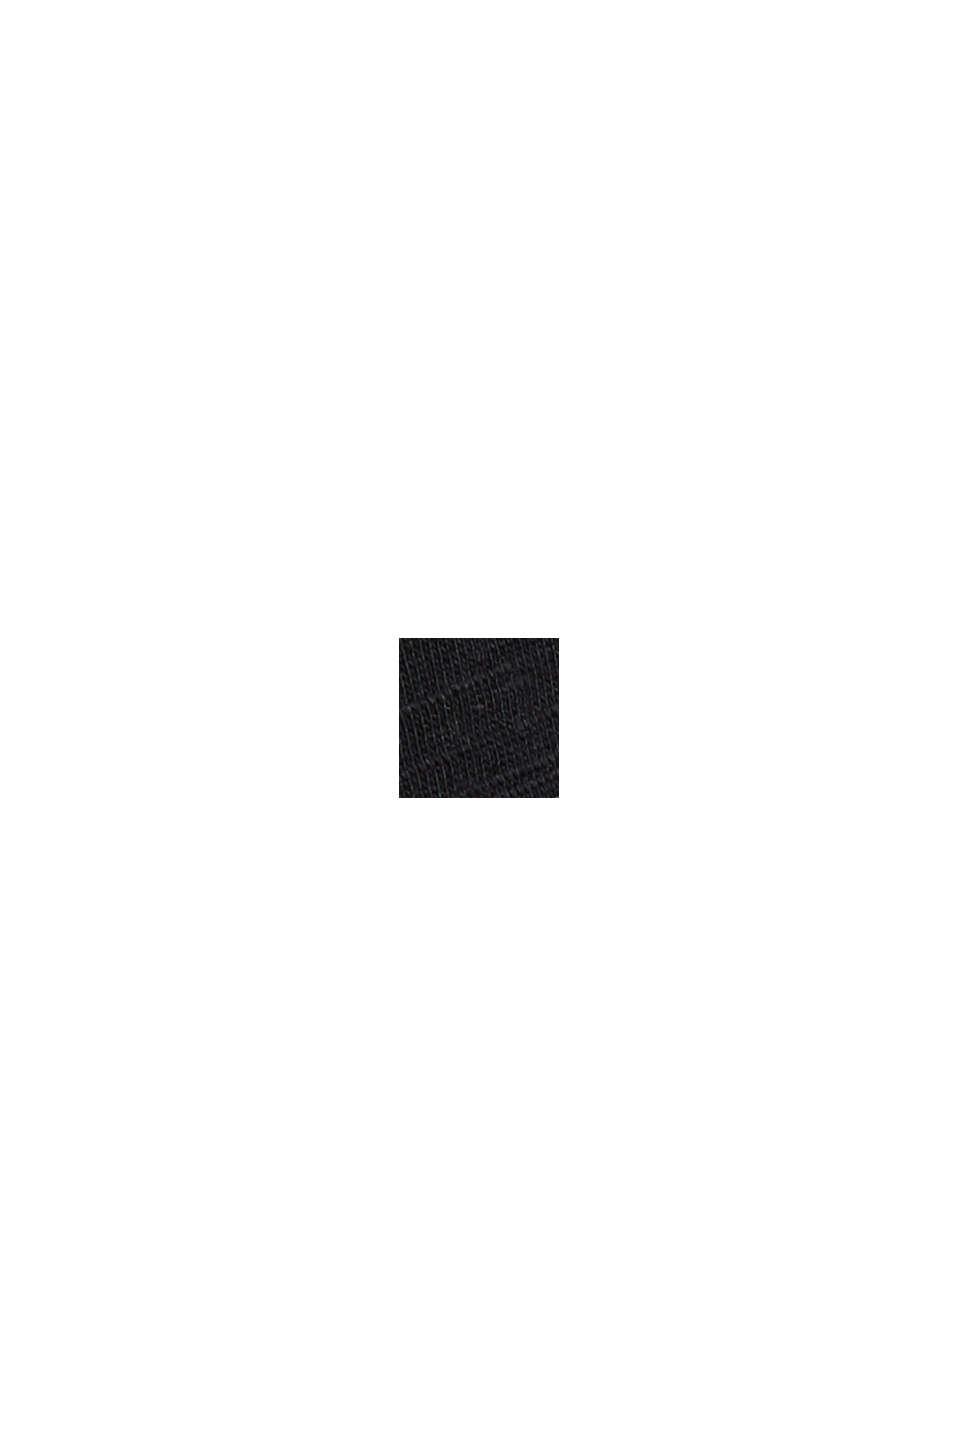 Camiseta en 100% algodón ecológico, BLACK, swatch